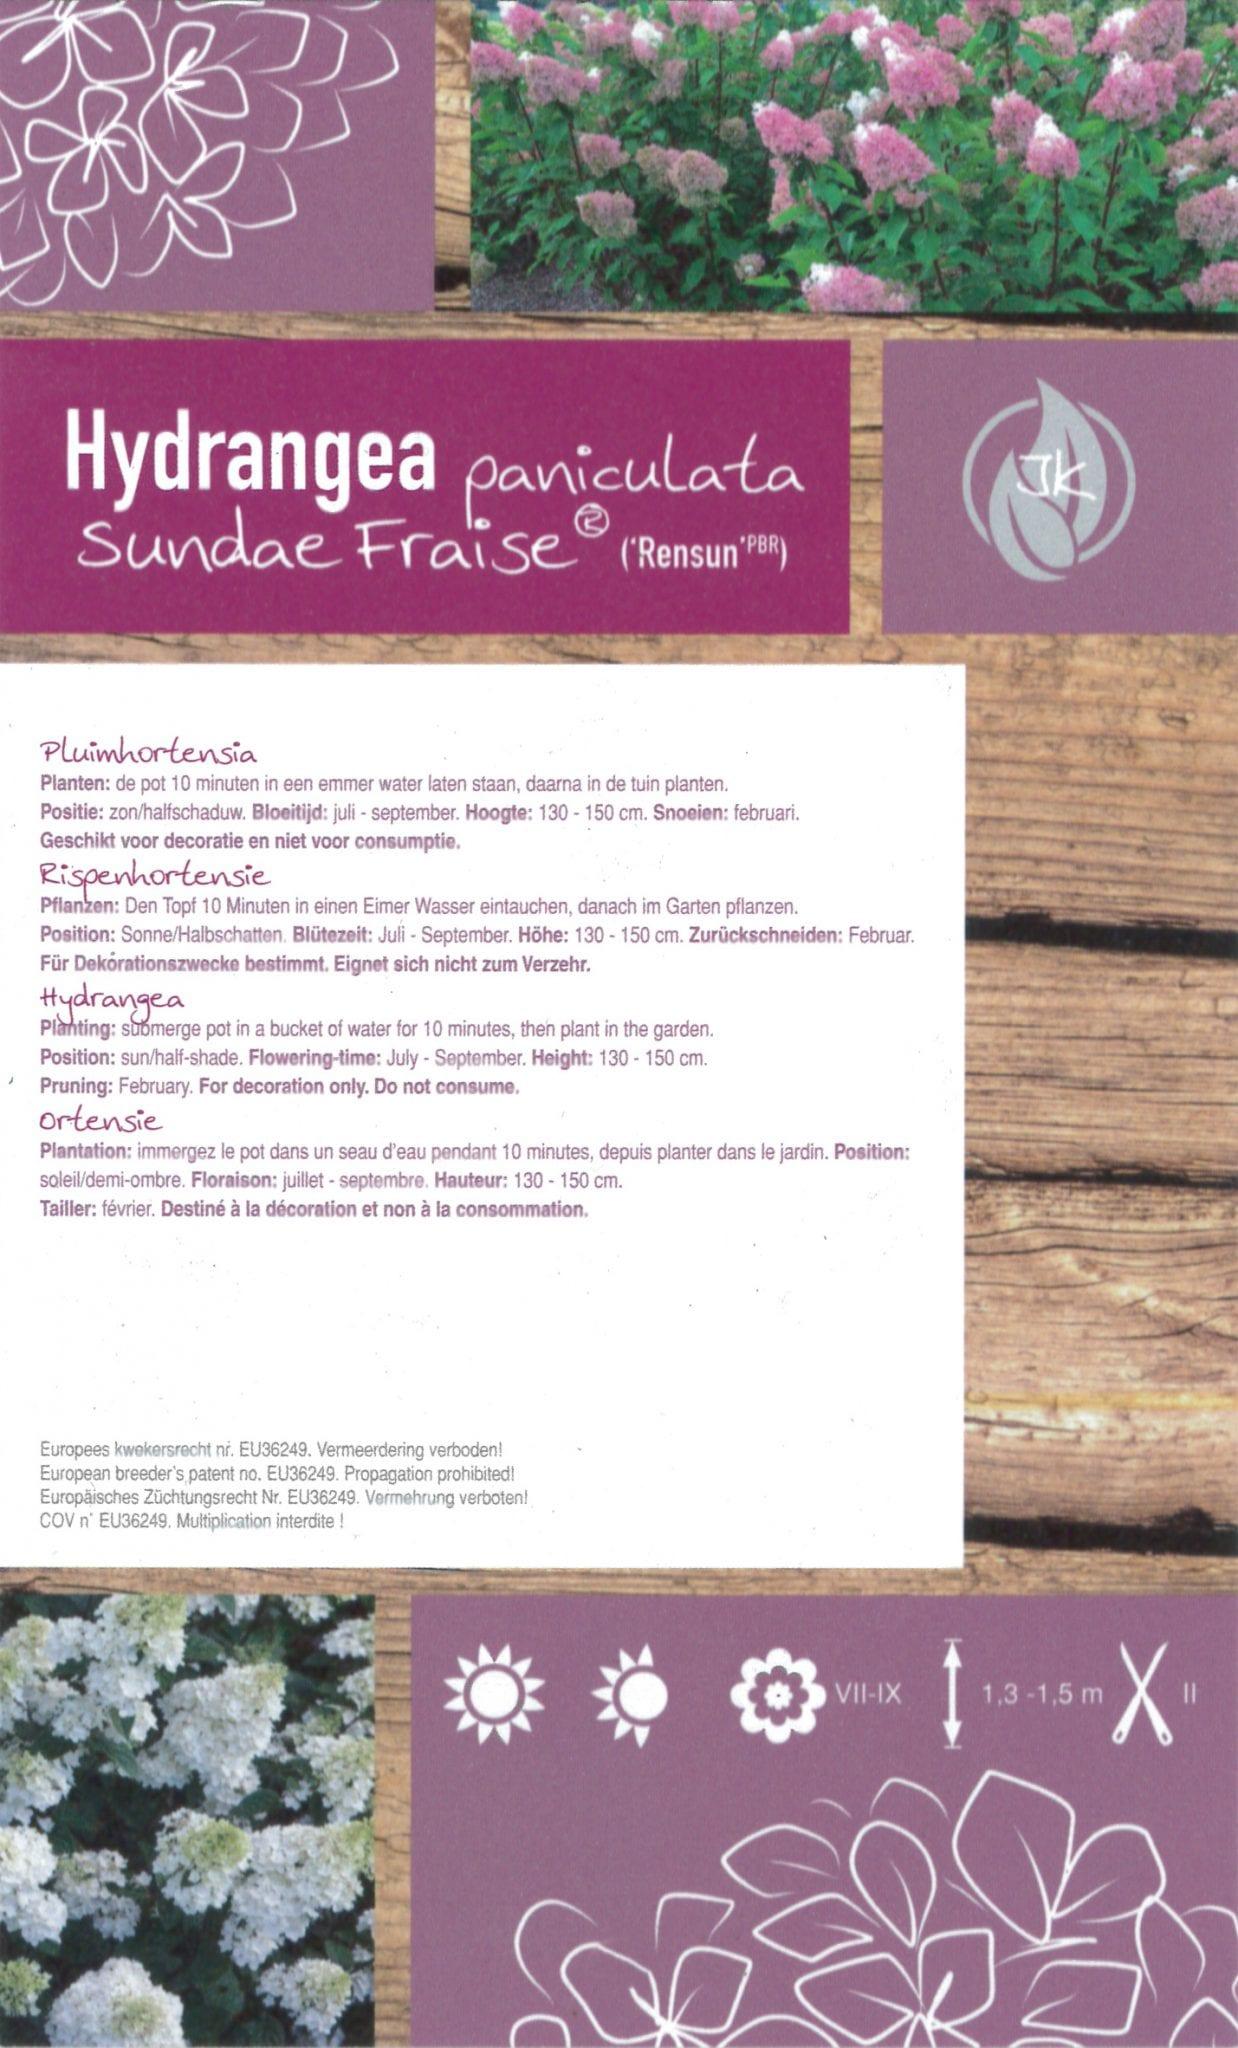 De Hydrangea paniculata 'Sundae Fraise (Rensun PBR)' etiket achterzijde | Plants By Nature - gespecialiseerd in hydrangea